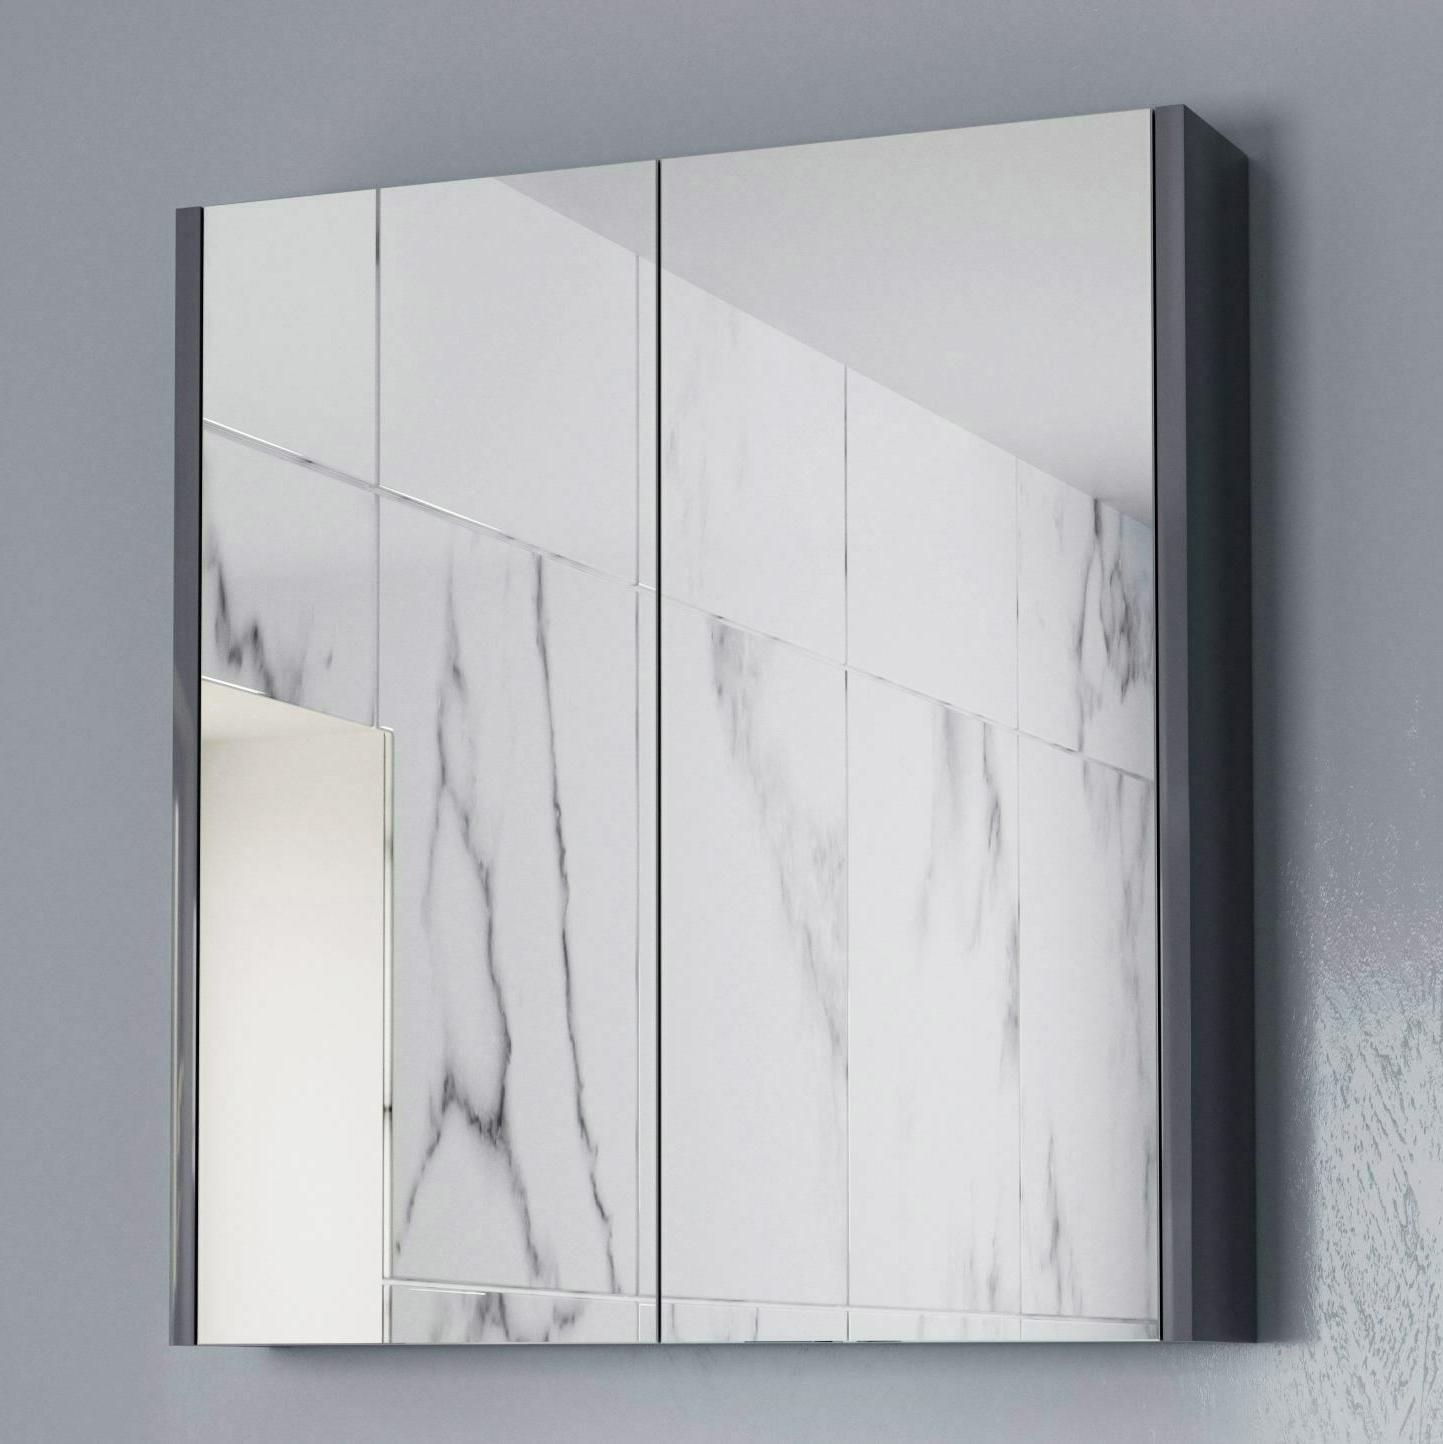 2020 Fancy Bathroom Wall Mirrors In 600mm Bathroom Mirror Cabinet 2 Door Storage Cupboard Wall Mounted Grey Gloss (View 10 of 20)